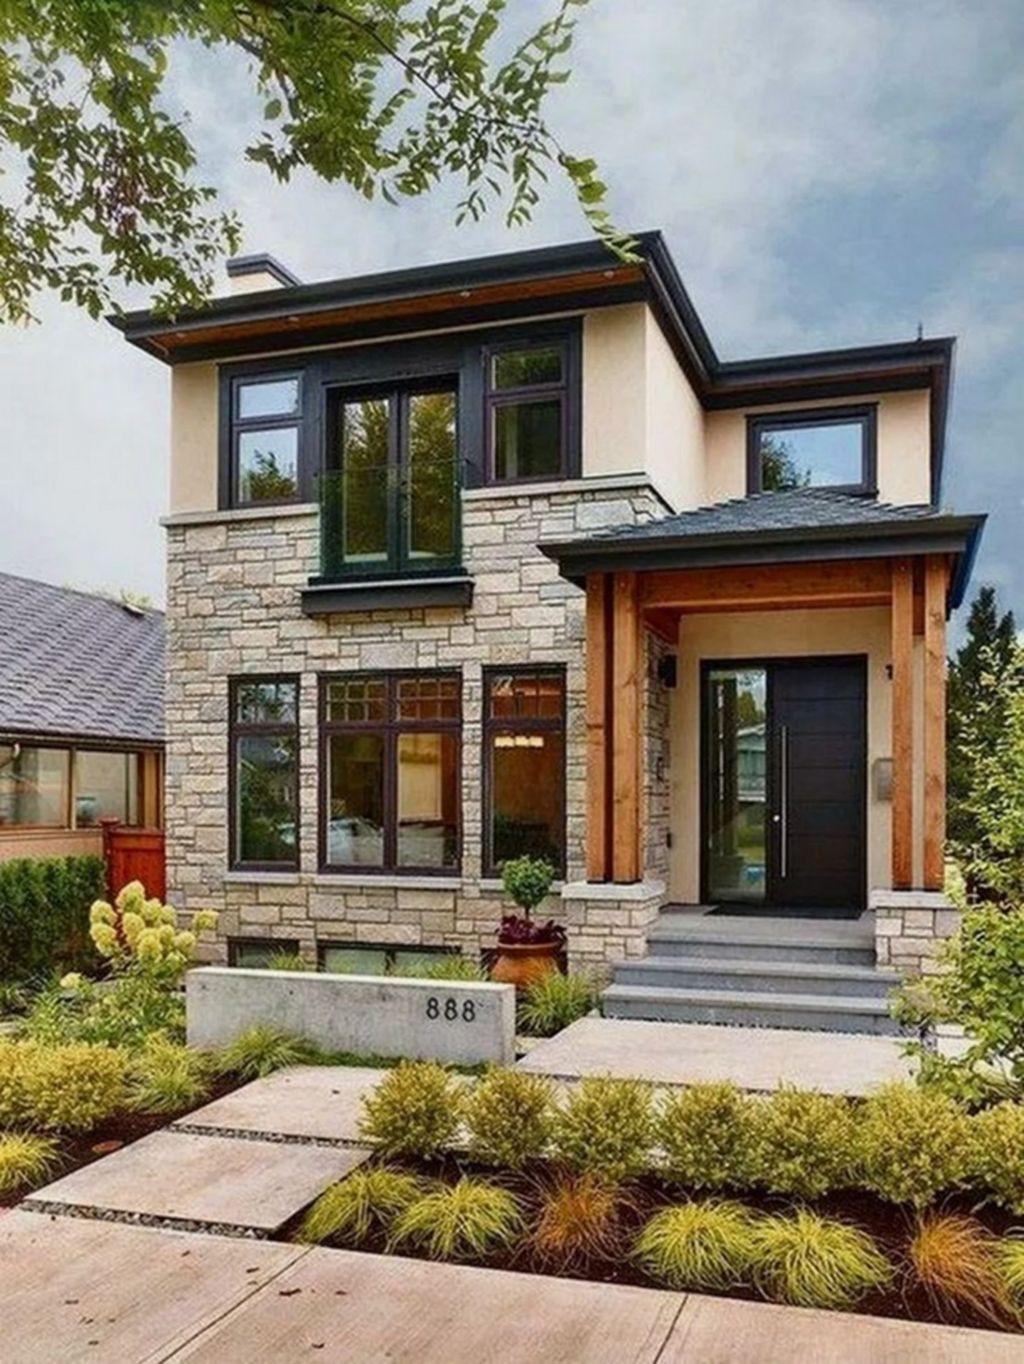 37 Stunning Modern House Design Ideas Trendehouse Contemporary House Exterior Modern House Exterior Contemporary House Design